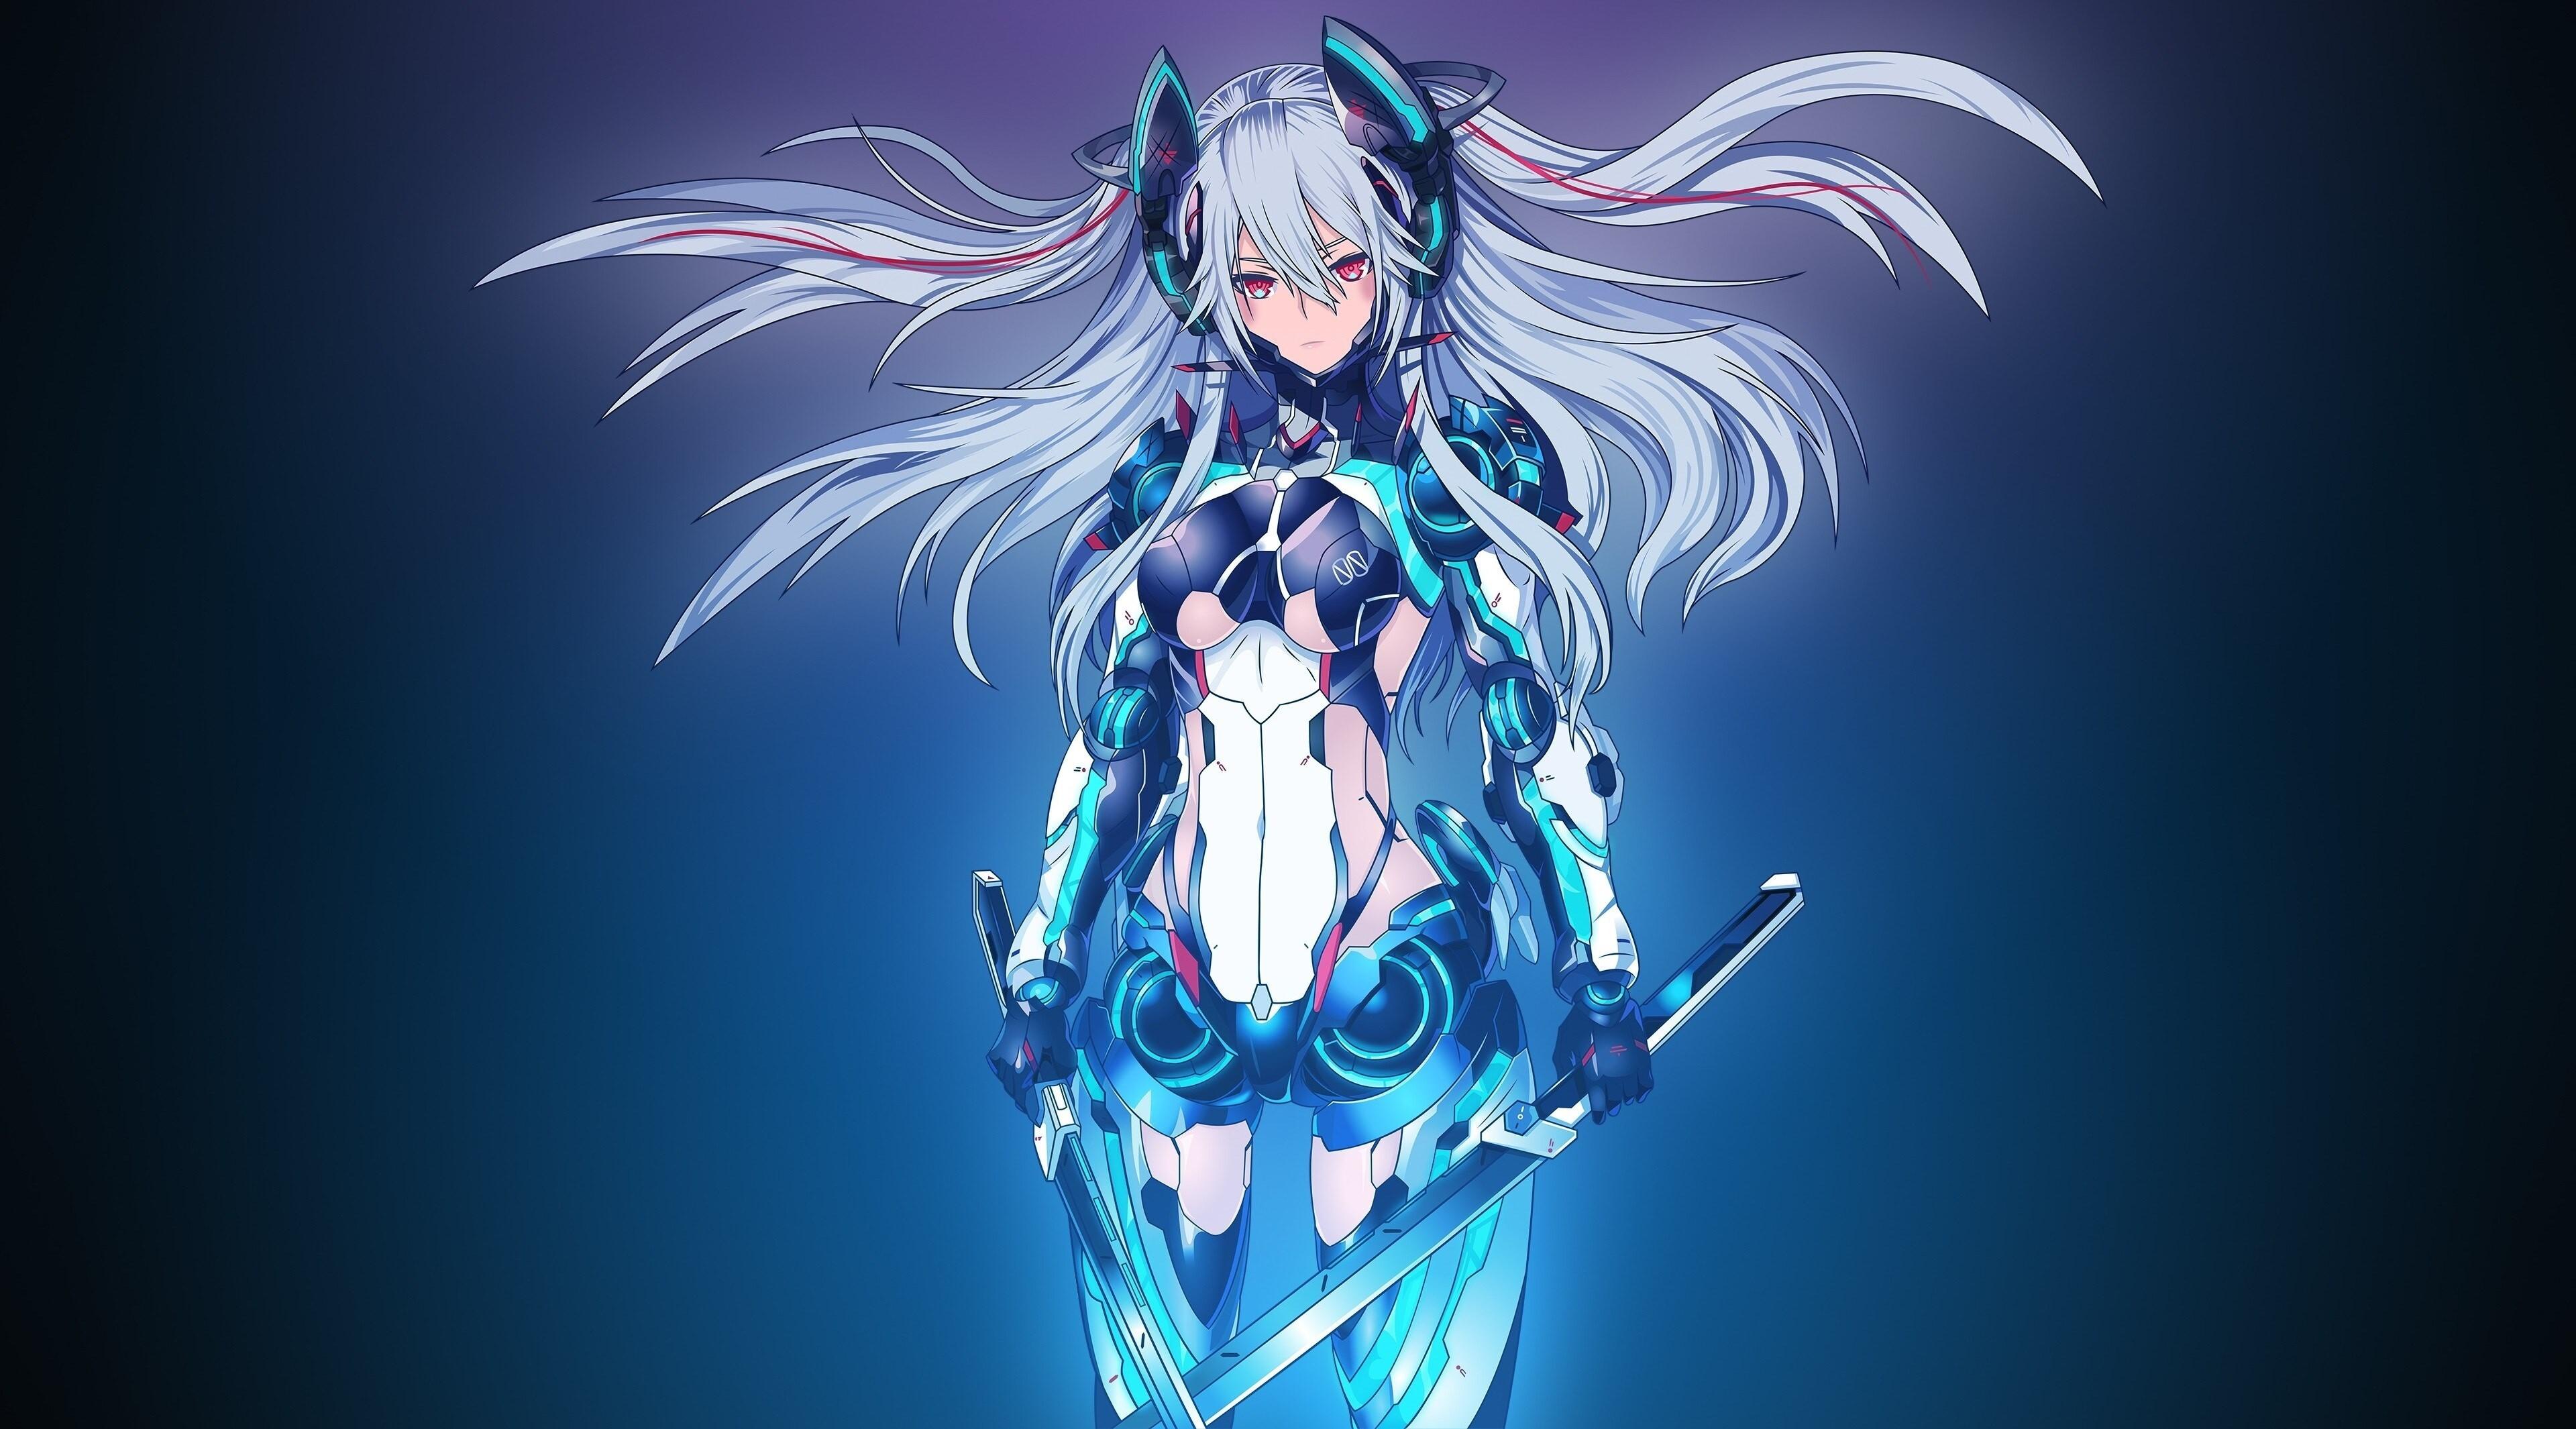 Res: 3840x2130,  anime 4k pc hd wallpaper download